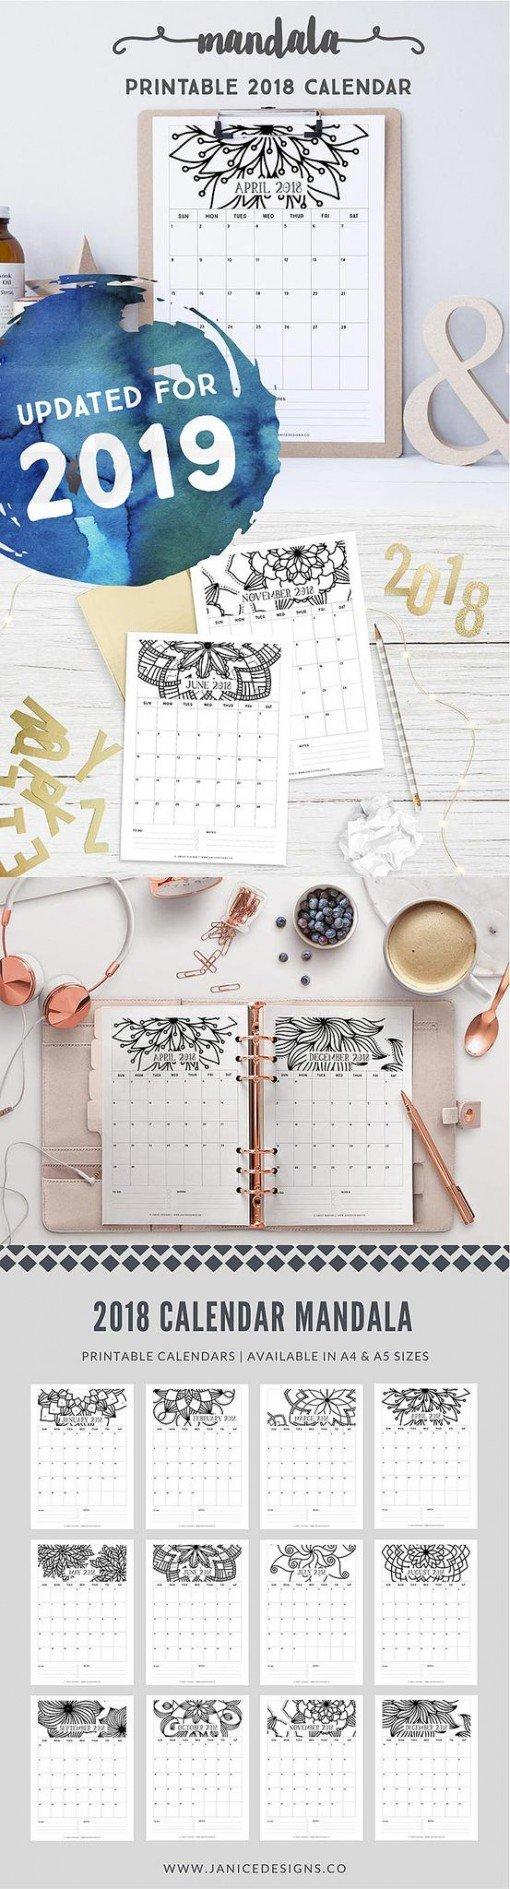 2019 Printable Calendar - Mandala